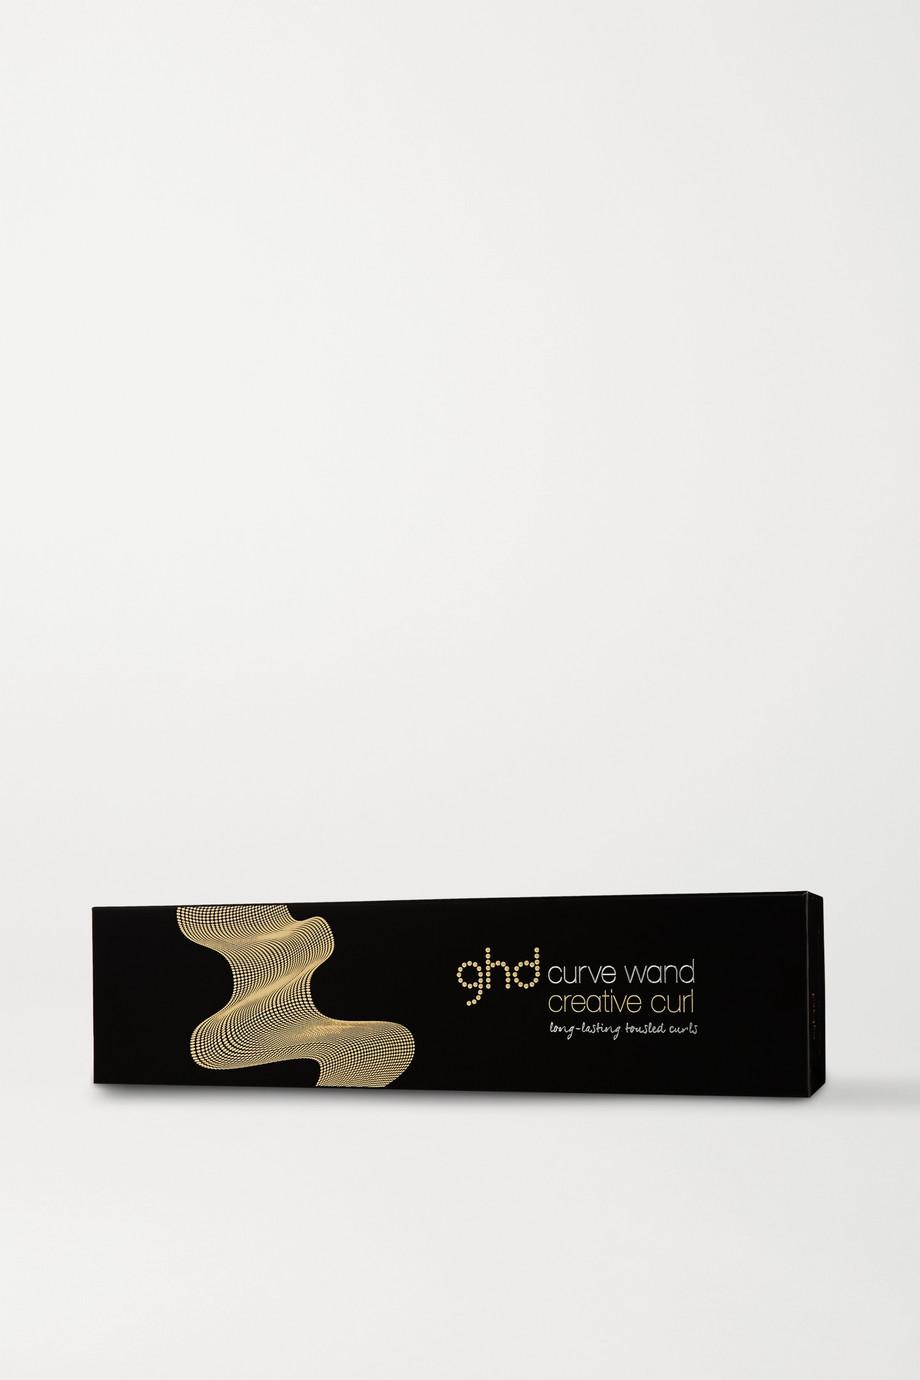 ghd Creative Curl Wand - UK 3-pin plug